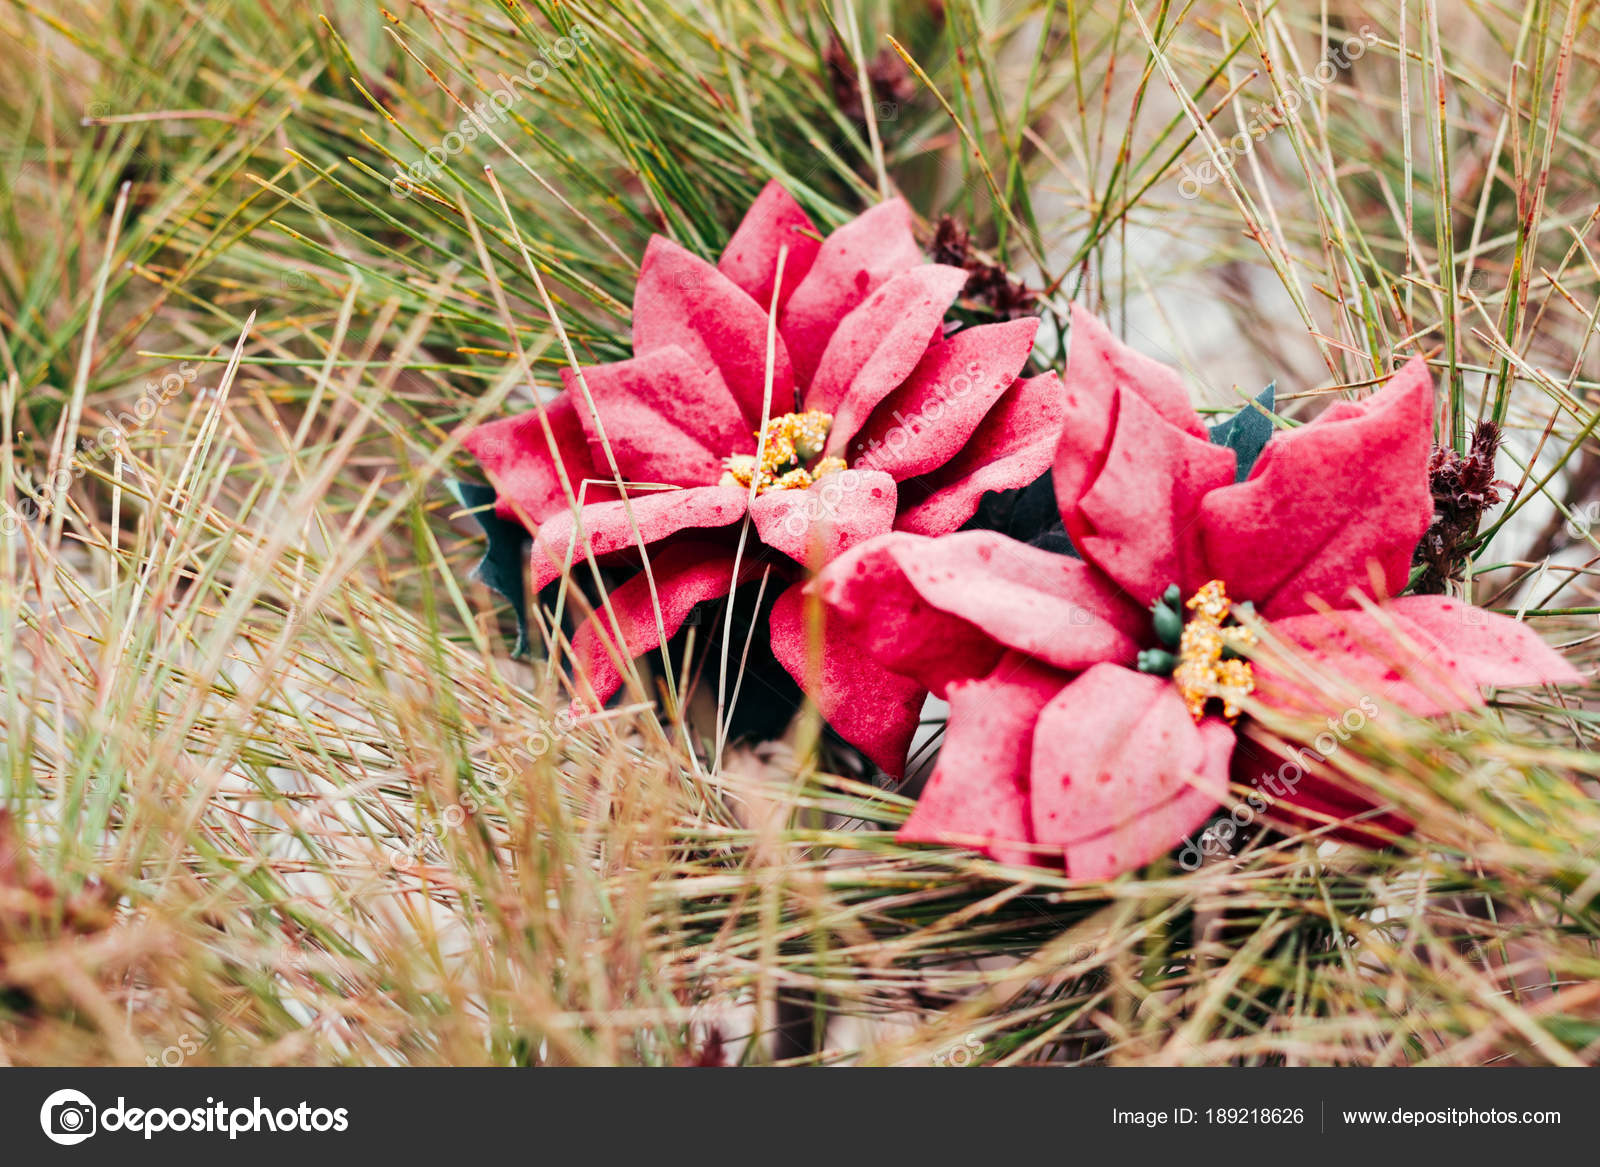 Red poinsettia flower on pine tree stock photo sangapark 189218626 red poinsettia flower on pine tree stock photo mightylinksfo